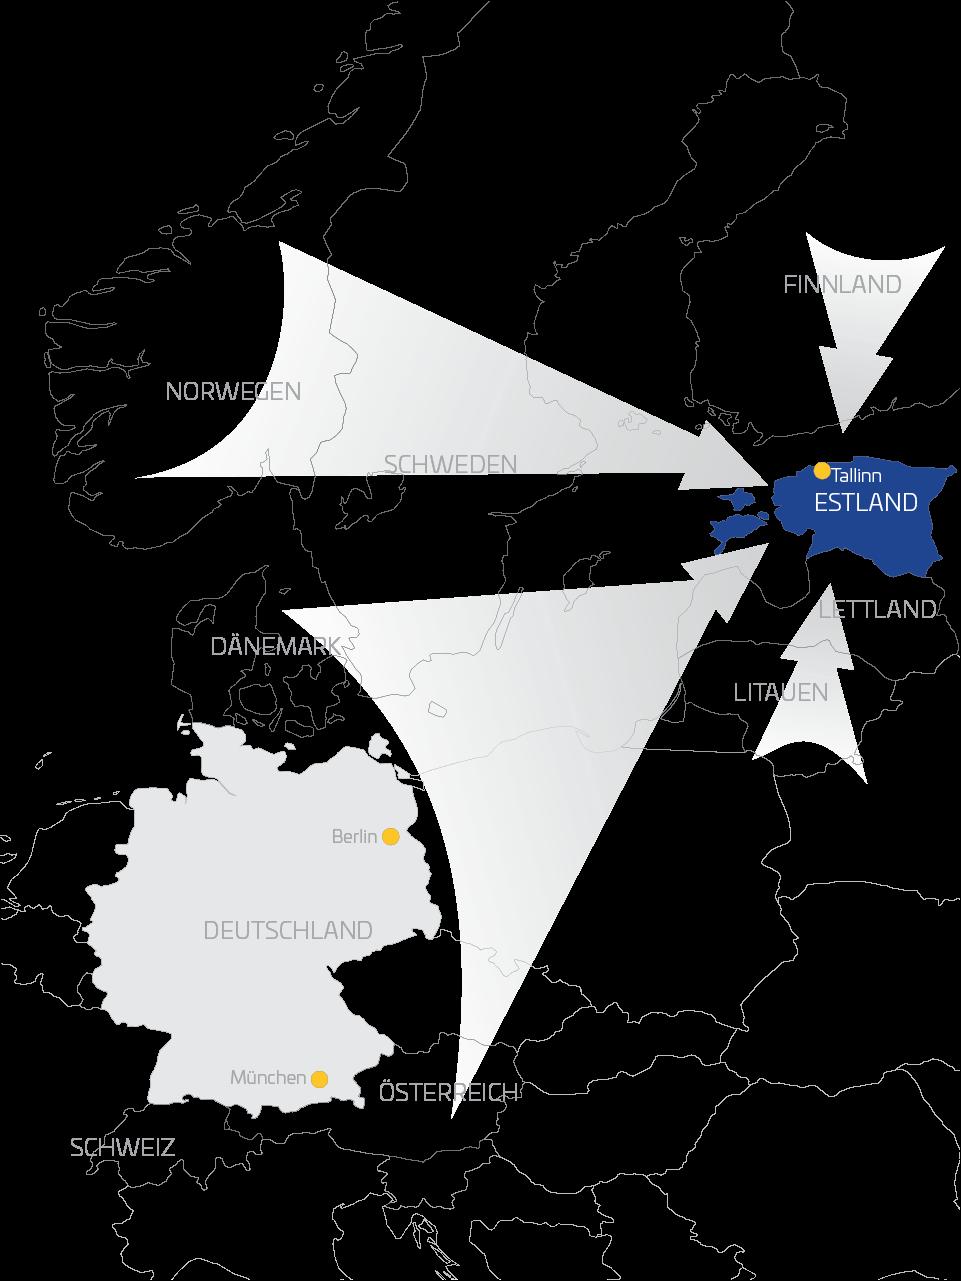 Estland innovation hub